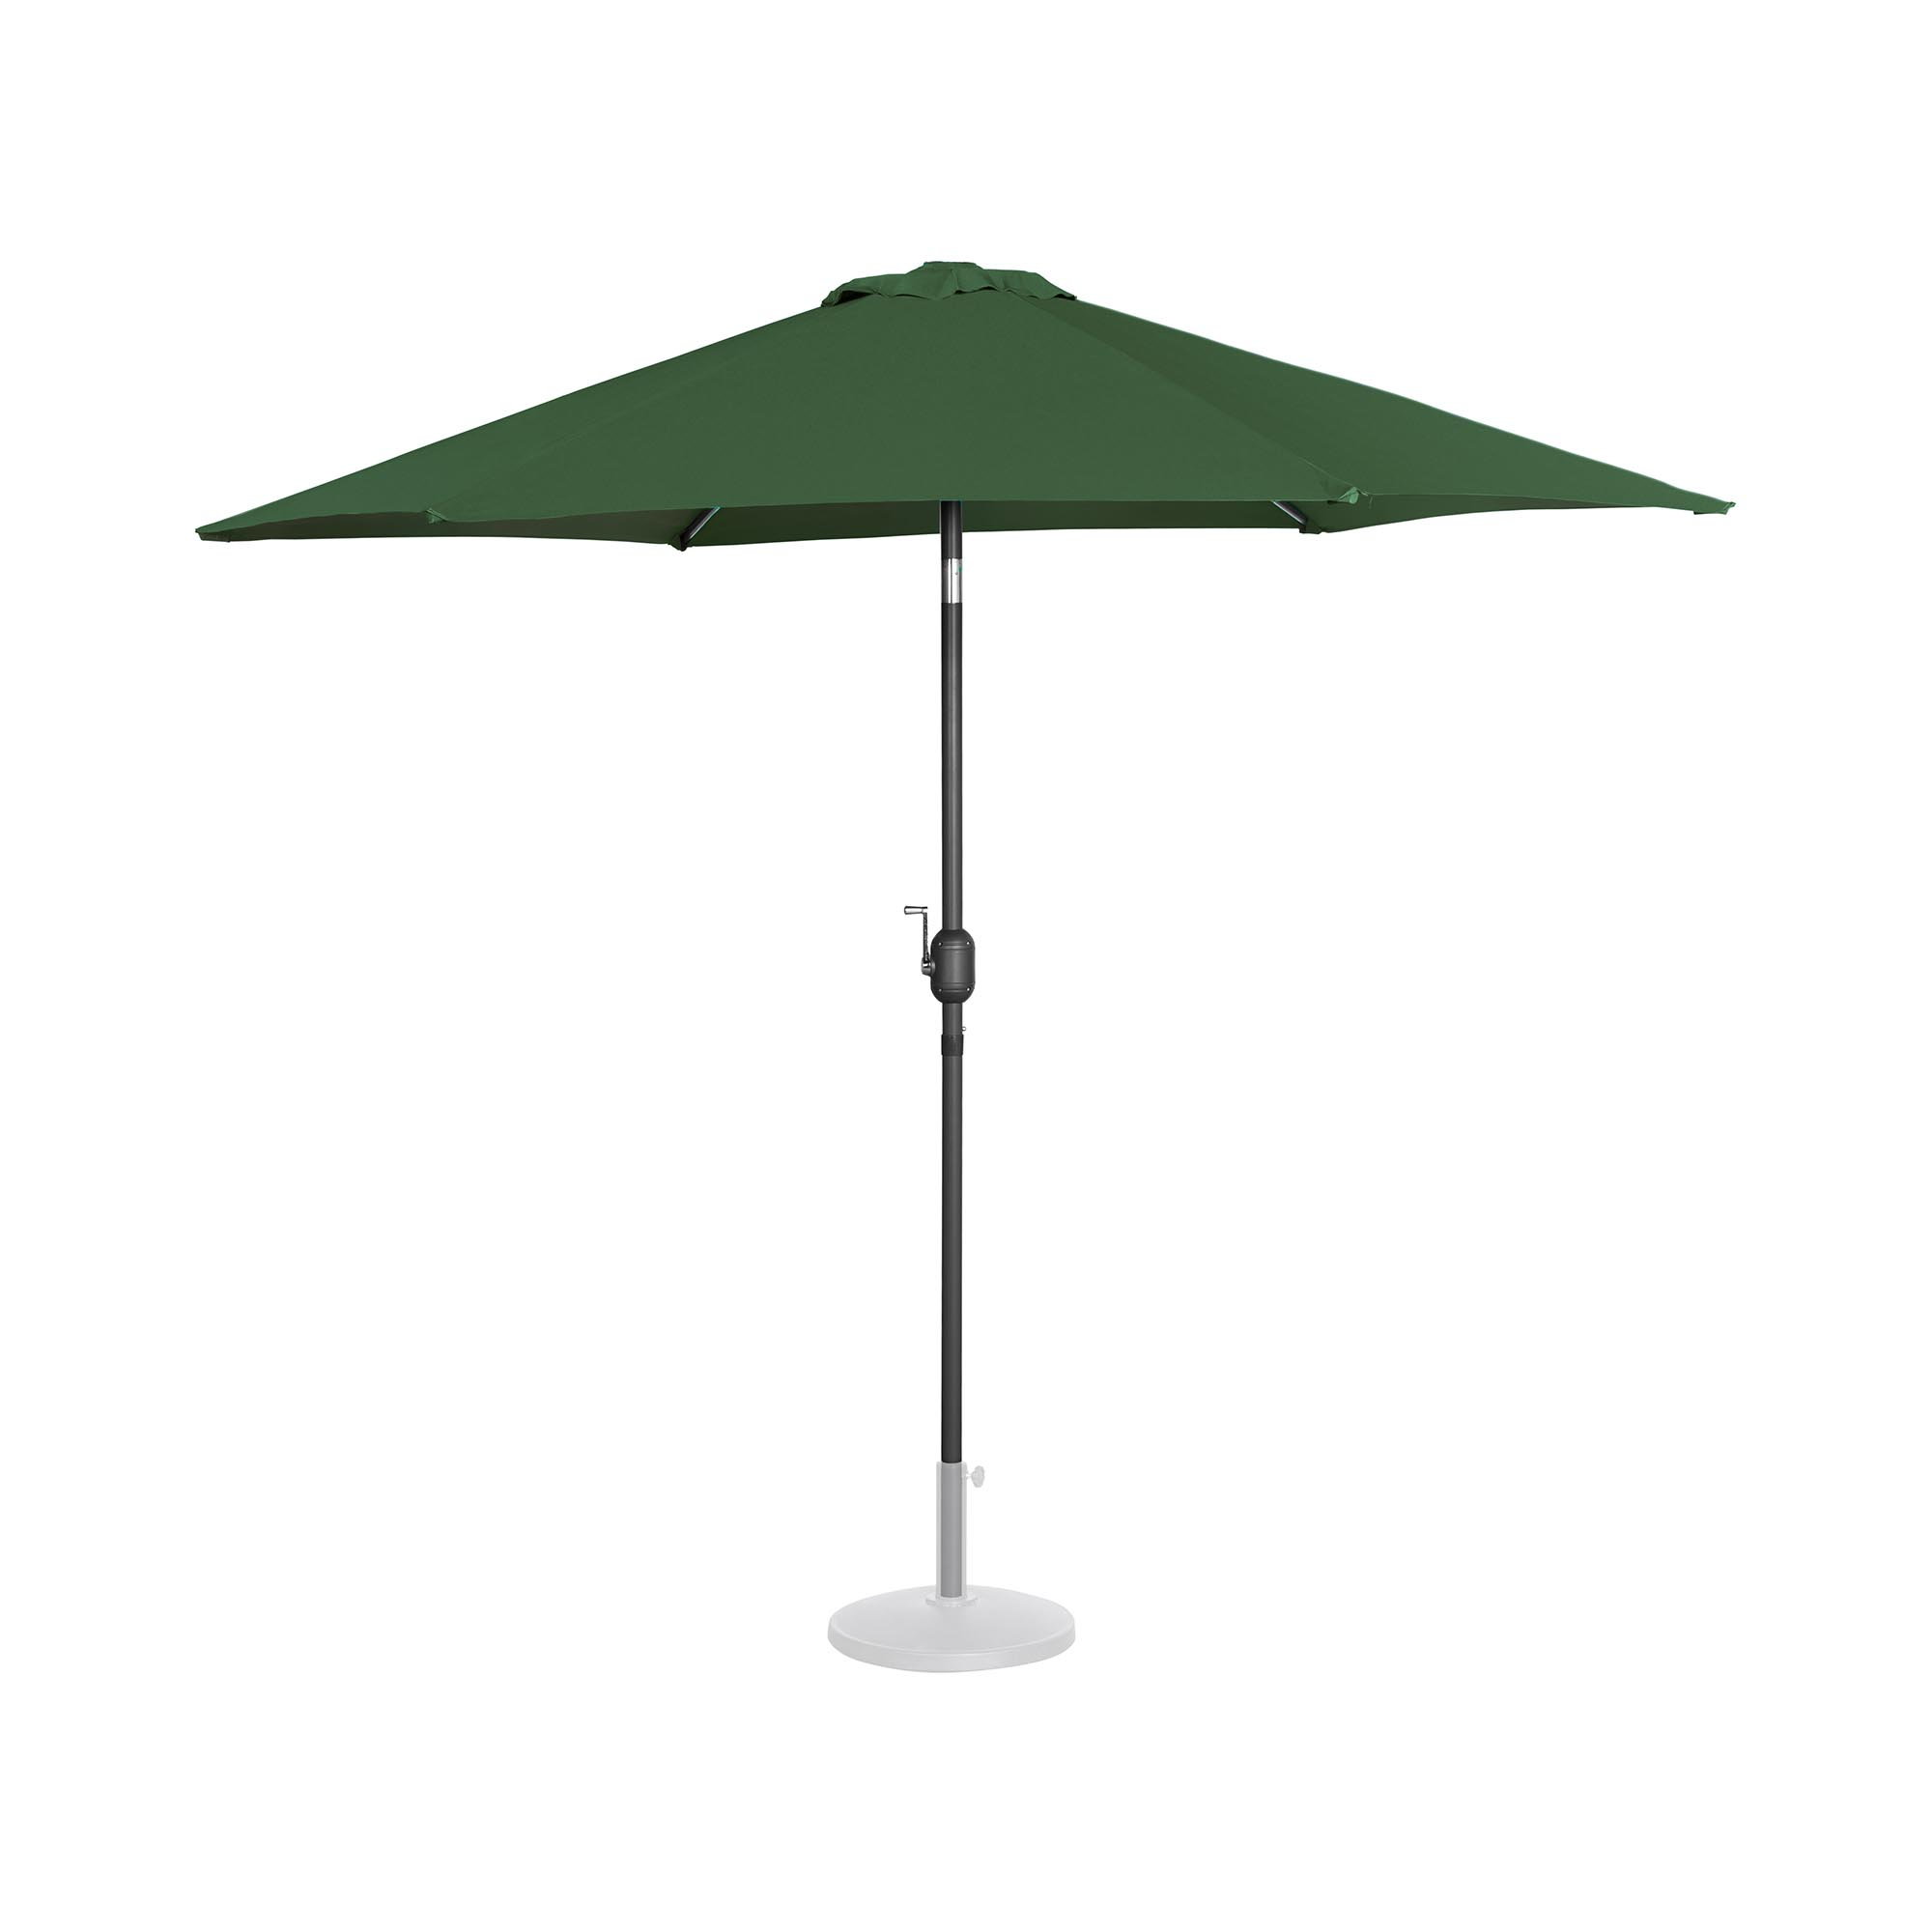 Uniprodo Sonnenschirm groß - grün - sechseckig - Ø 270 cm - neigbar UNI_UMBRELLA_R270GR